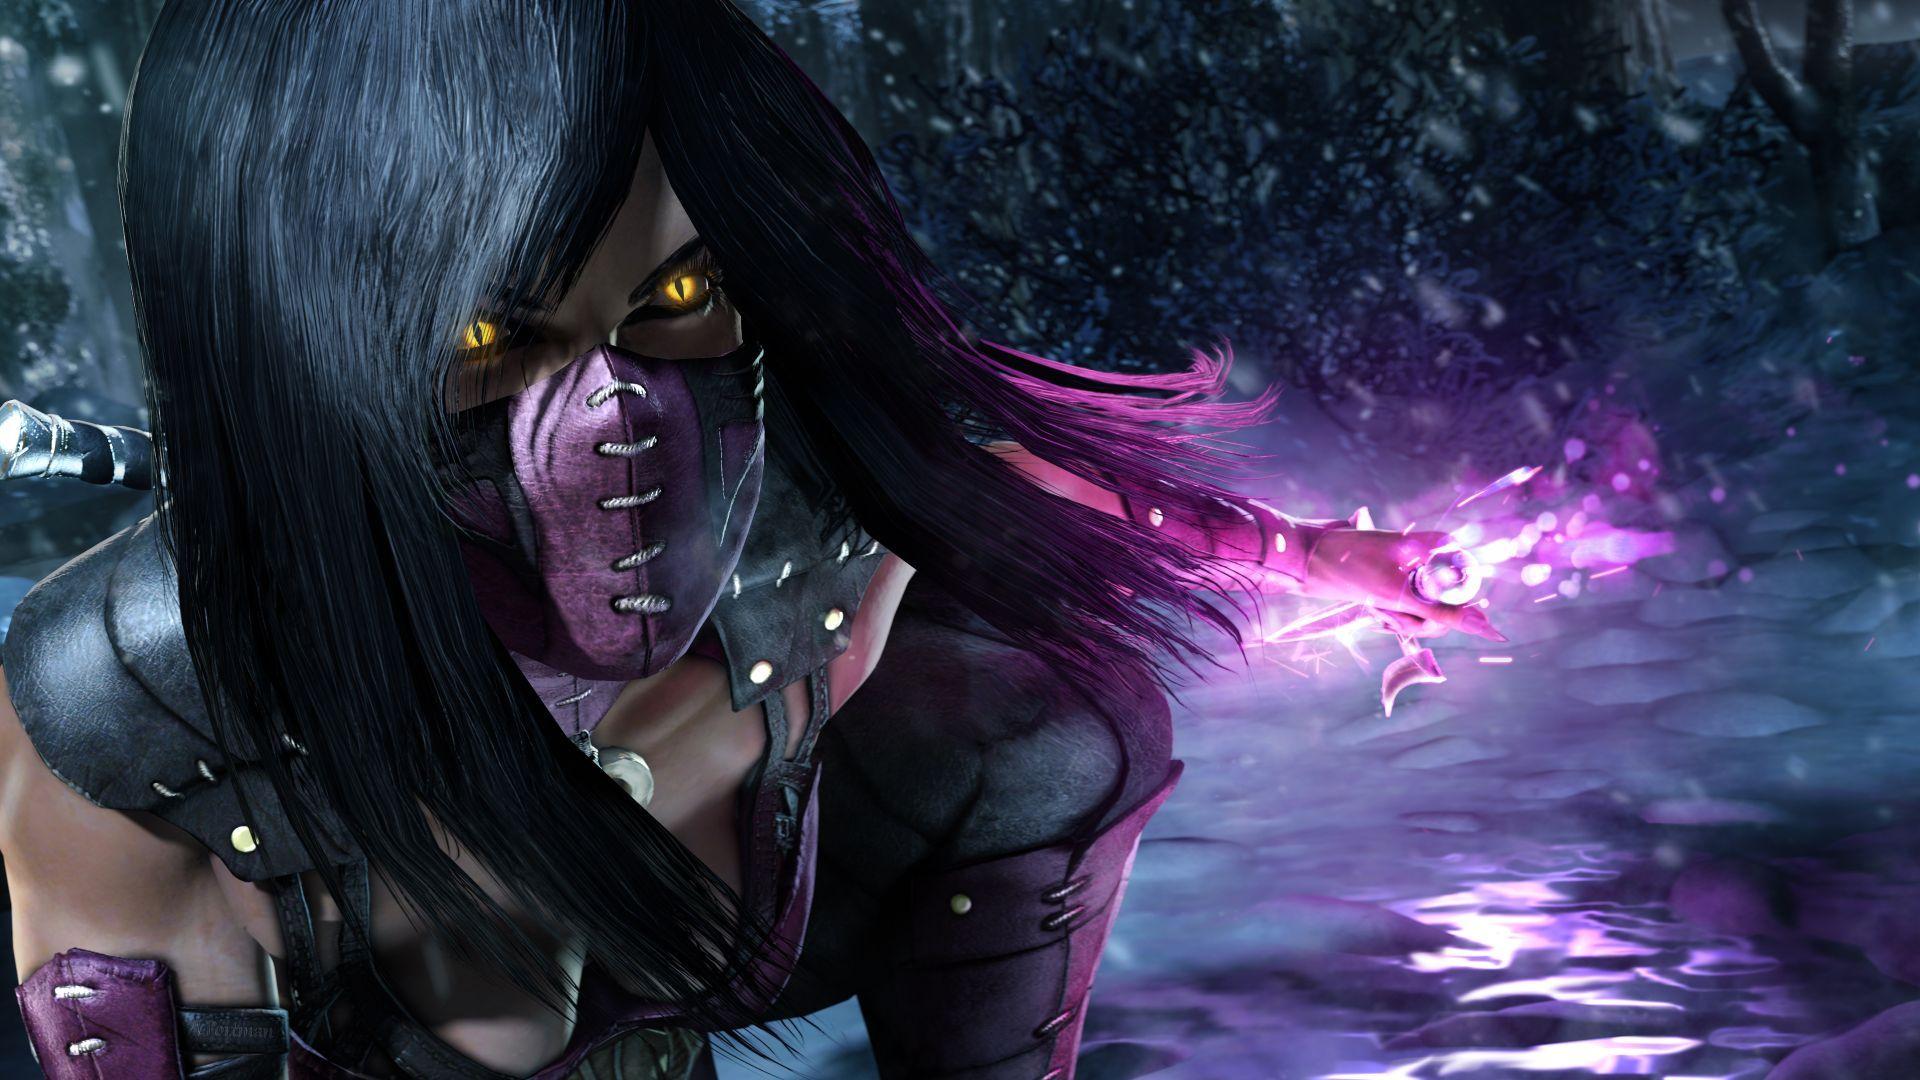 Mileena Mortal Kombat X Pc Games Xbox One Ps4 Mortal Kombat